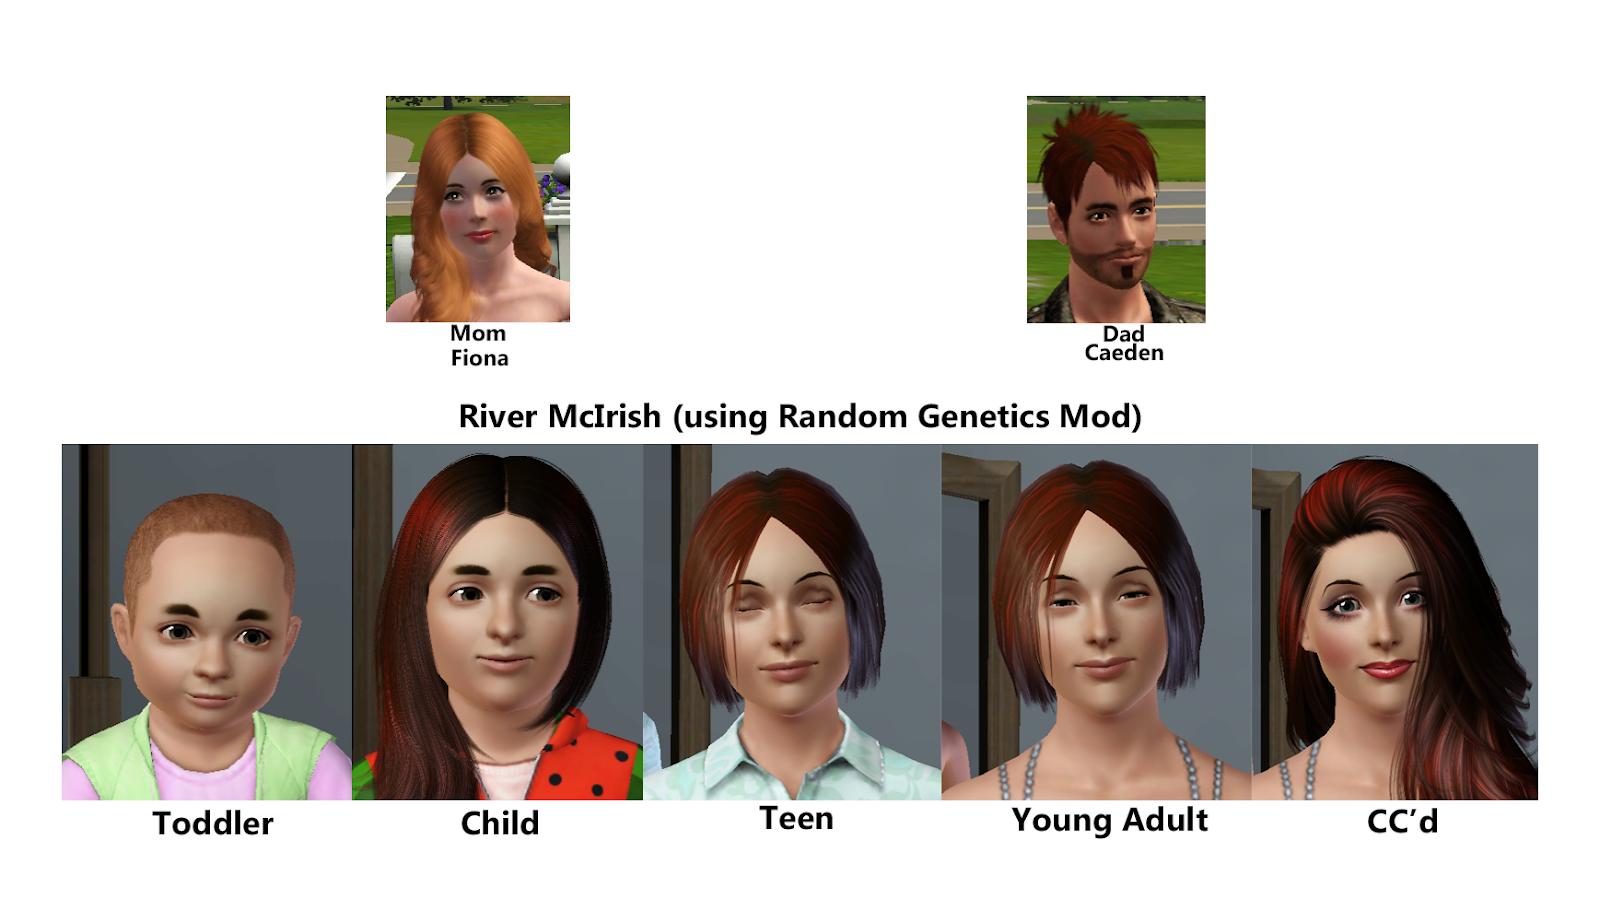 River_McIrish_Parents_RandomGeneticsMod.png